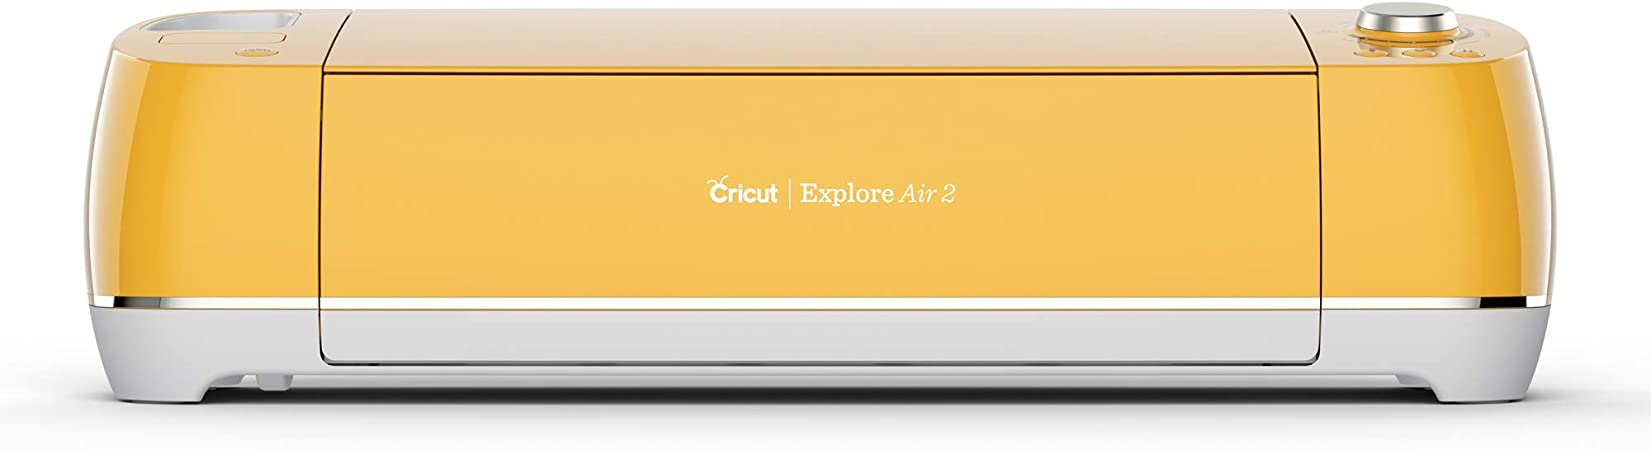 Cricut Explore Air 2 Sunflower - Plotter Creativo - Kreativplotter - Plotter de Corte - Enchufe EU: Amazon.es: Hogar